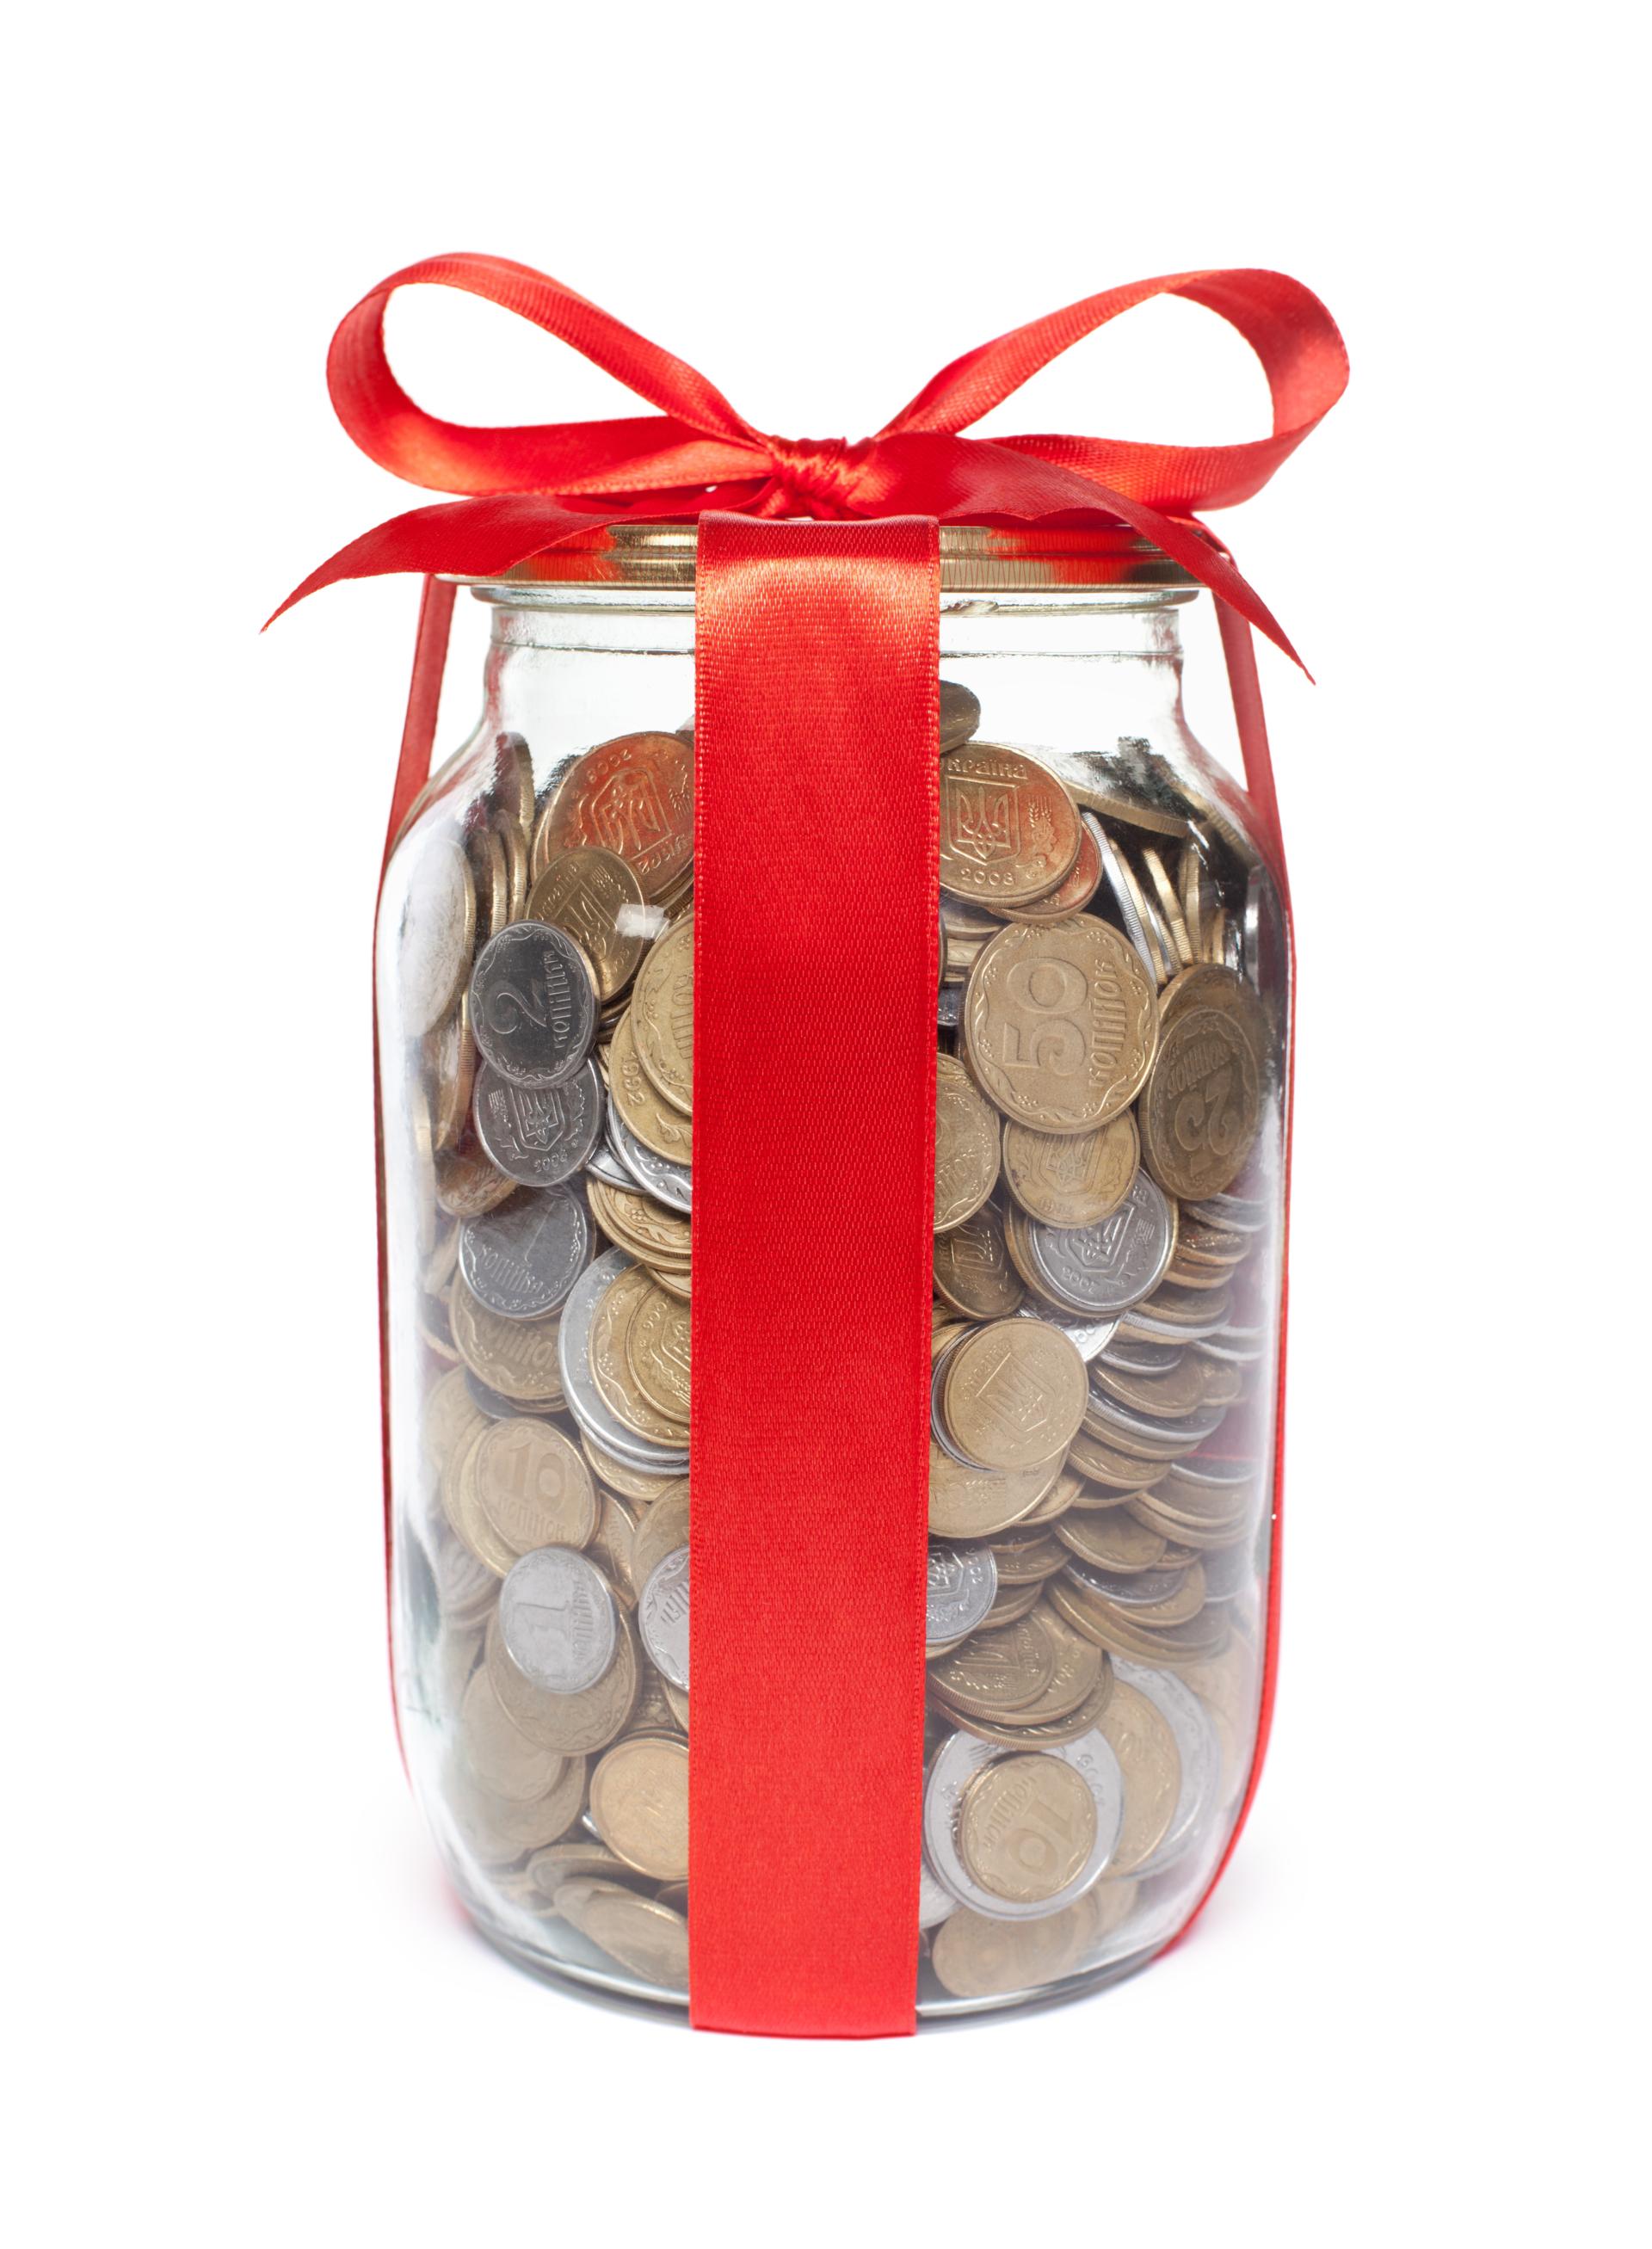 Saving Money On Everyday Home Expenditure